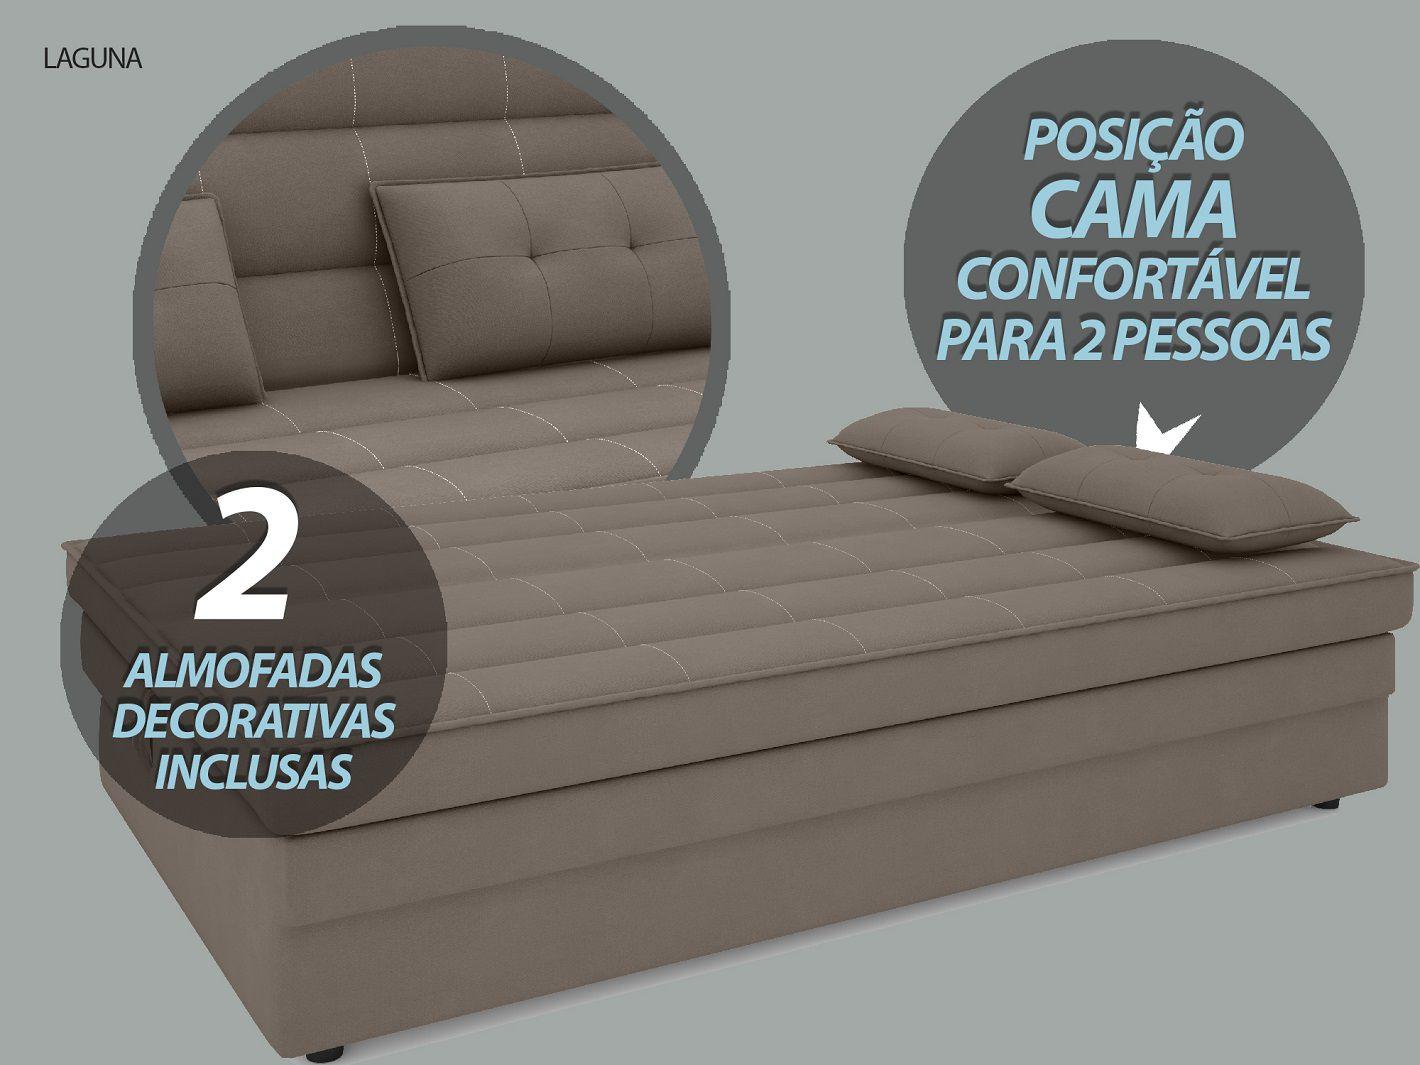 Sofá-Cama Casal Laguna 1,87m Velosuede Bege - NETSOFAS  - NETSOFÁS